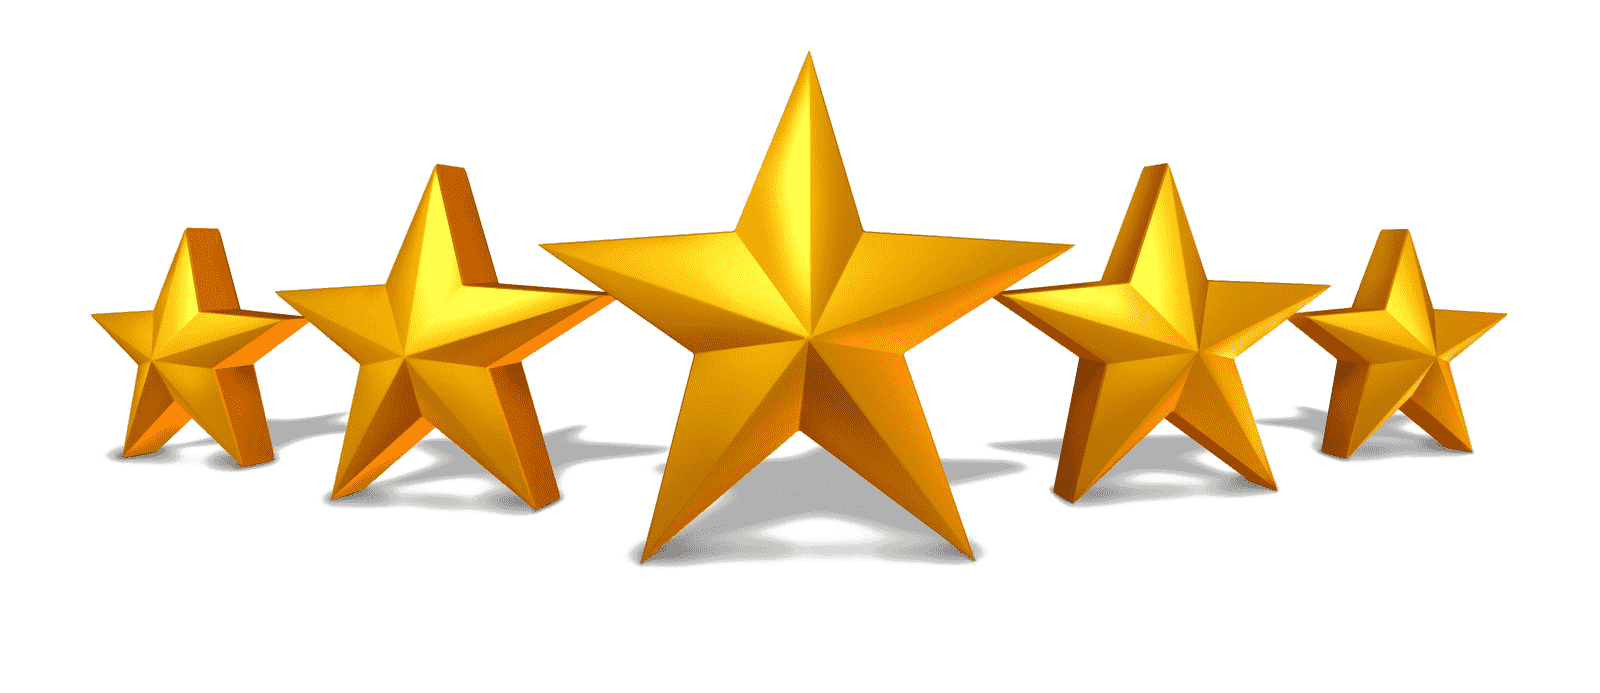 5-star customer rating